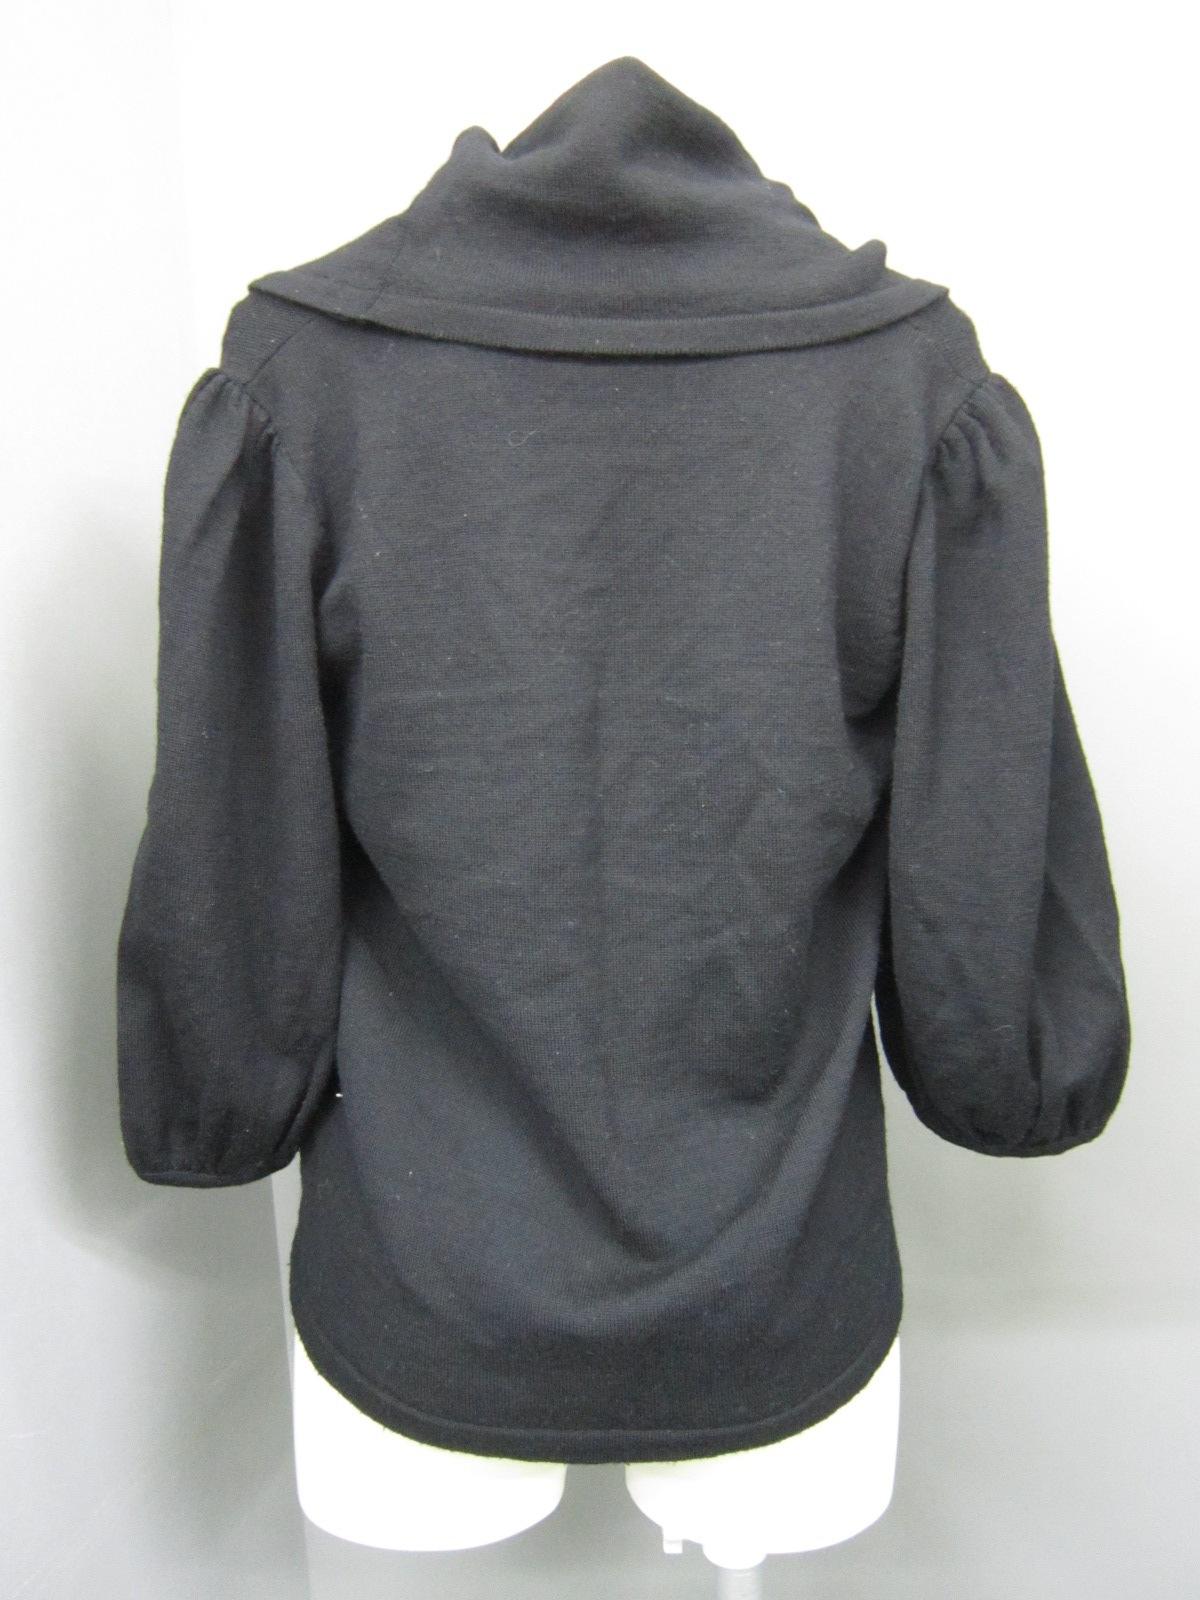 VIVIENNE TAM(ヴィヴィアンタム)のセーター